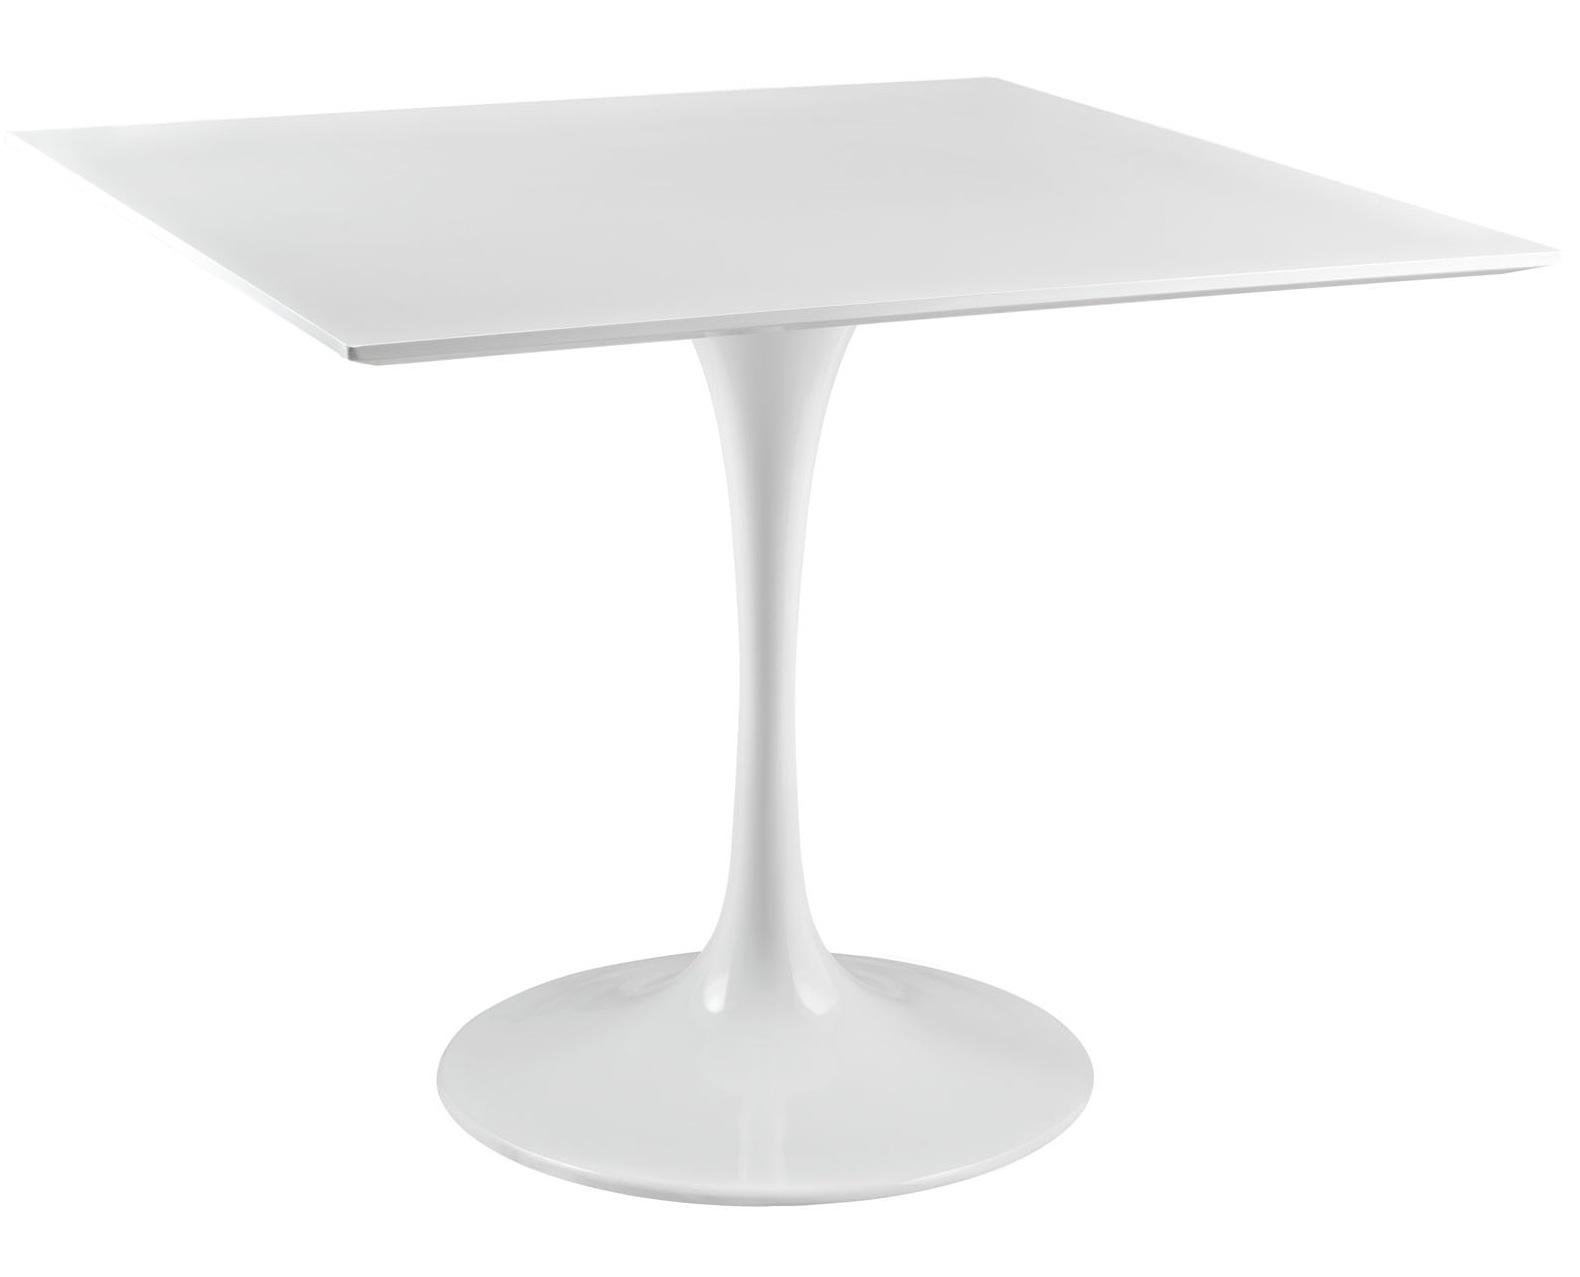 36inch-square-tulip-table.jpg